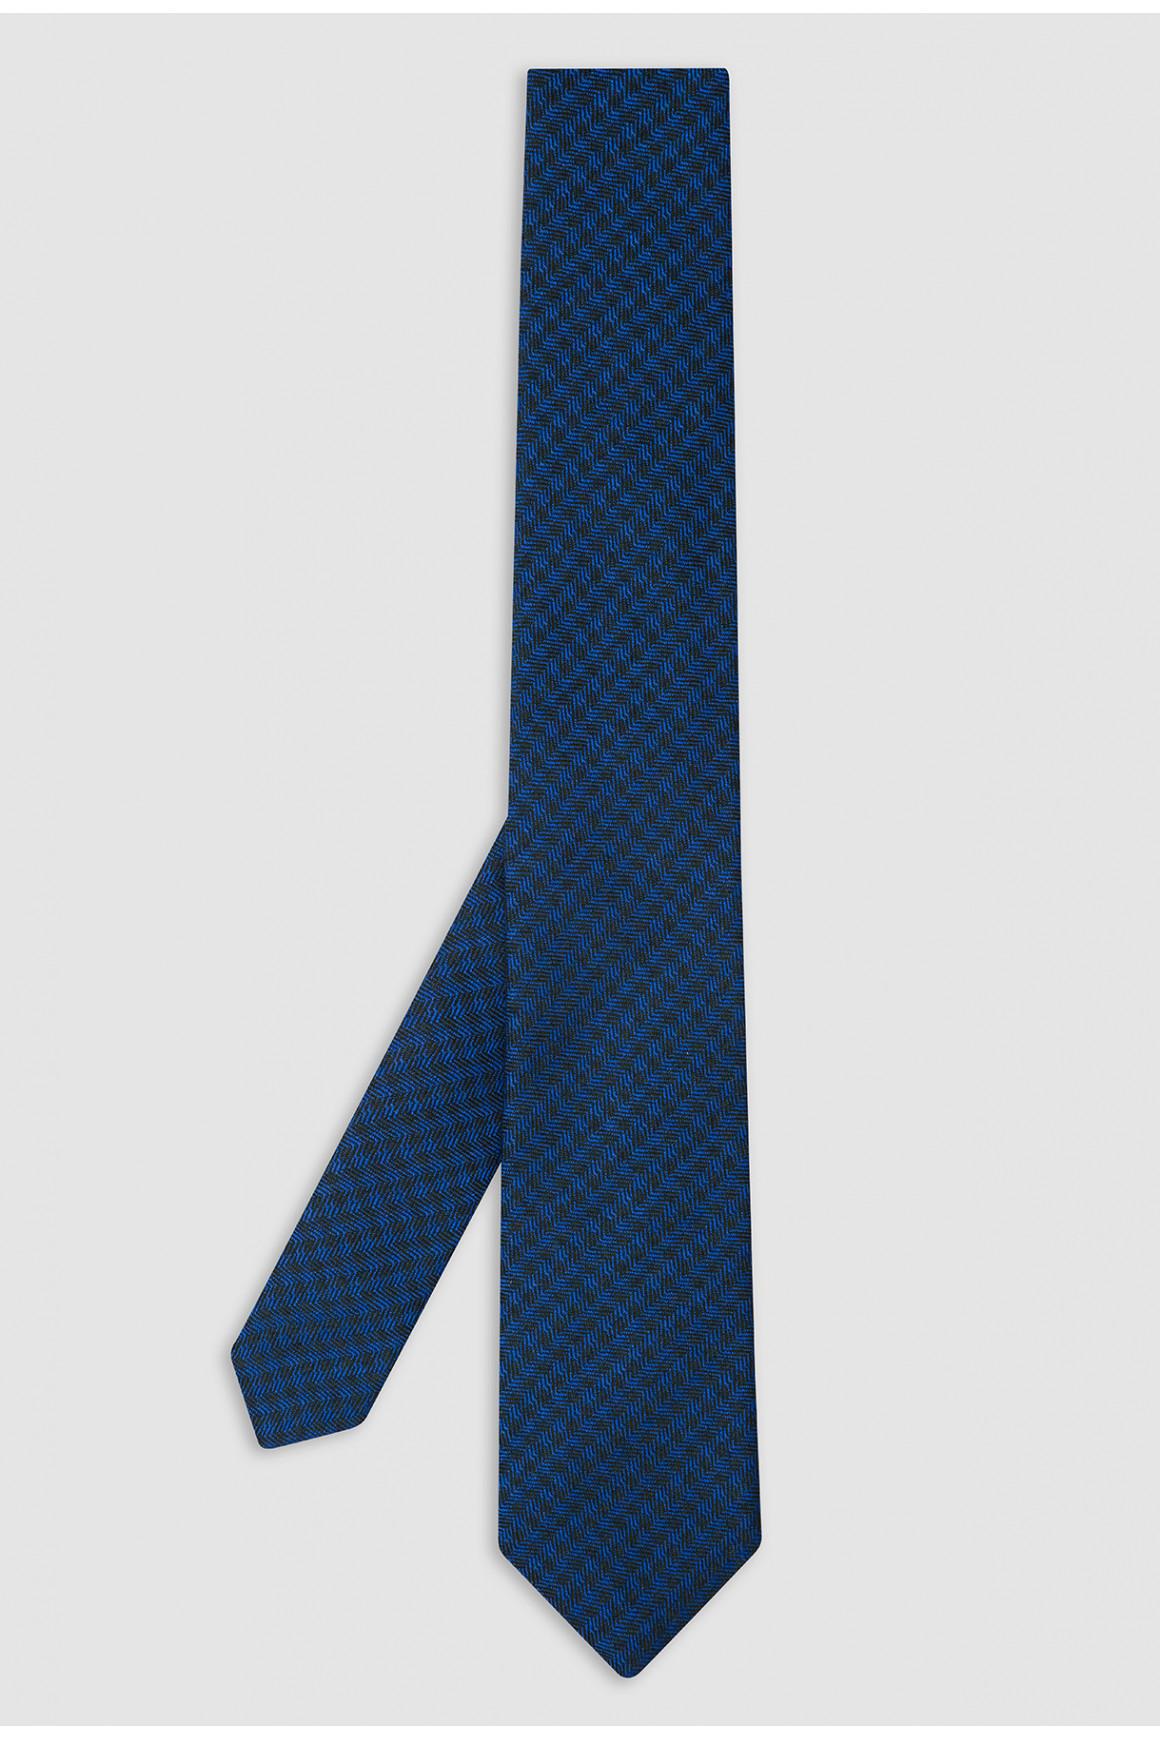 Cravate Bleu Vert Soie Et...